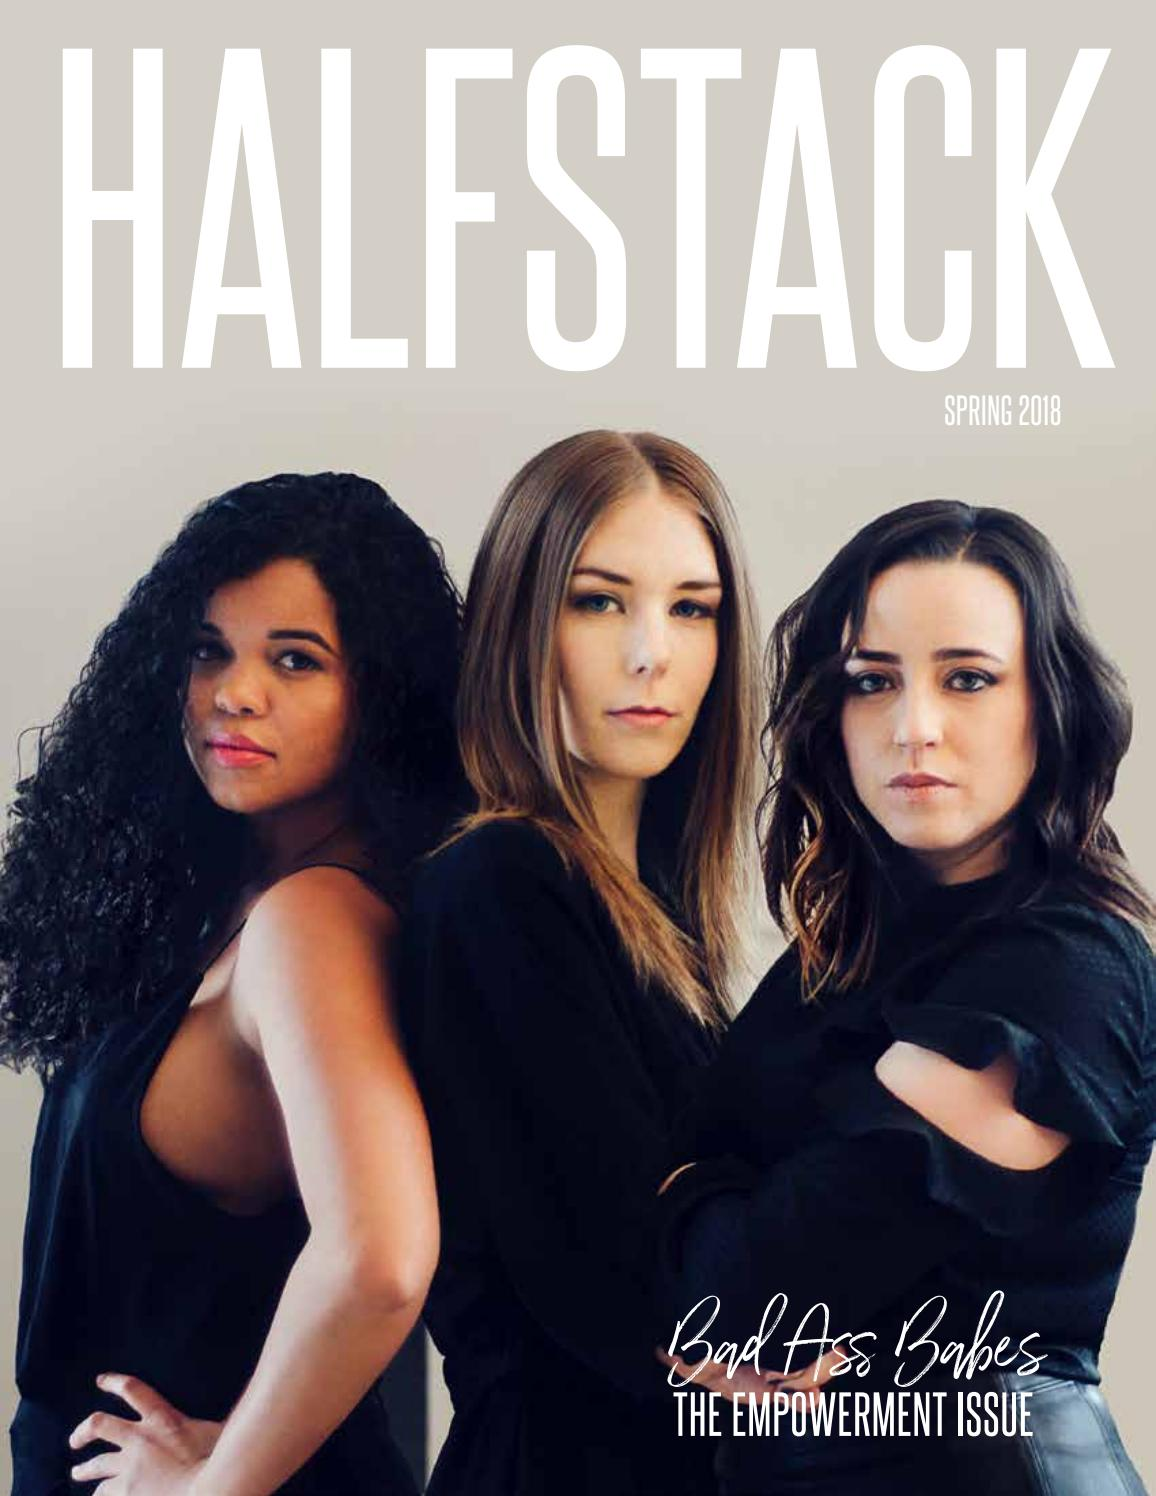 Halfstack Spring 2018 Issue By Magazine Issuu Tendencies Long Pants Rigid Quar Ter Chinos Navy 32